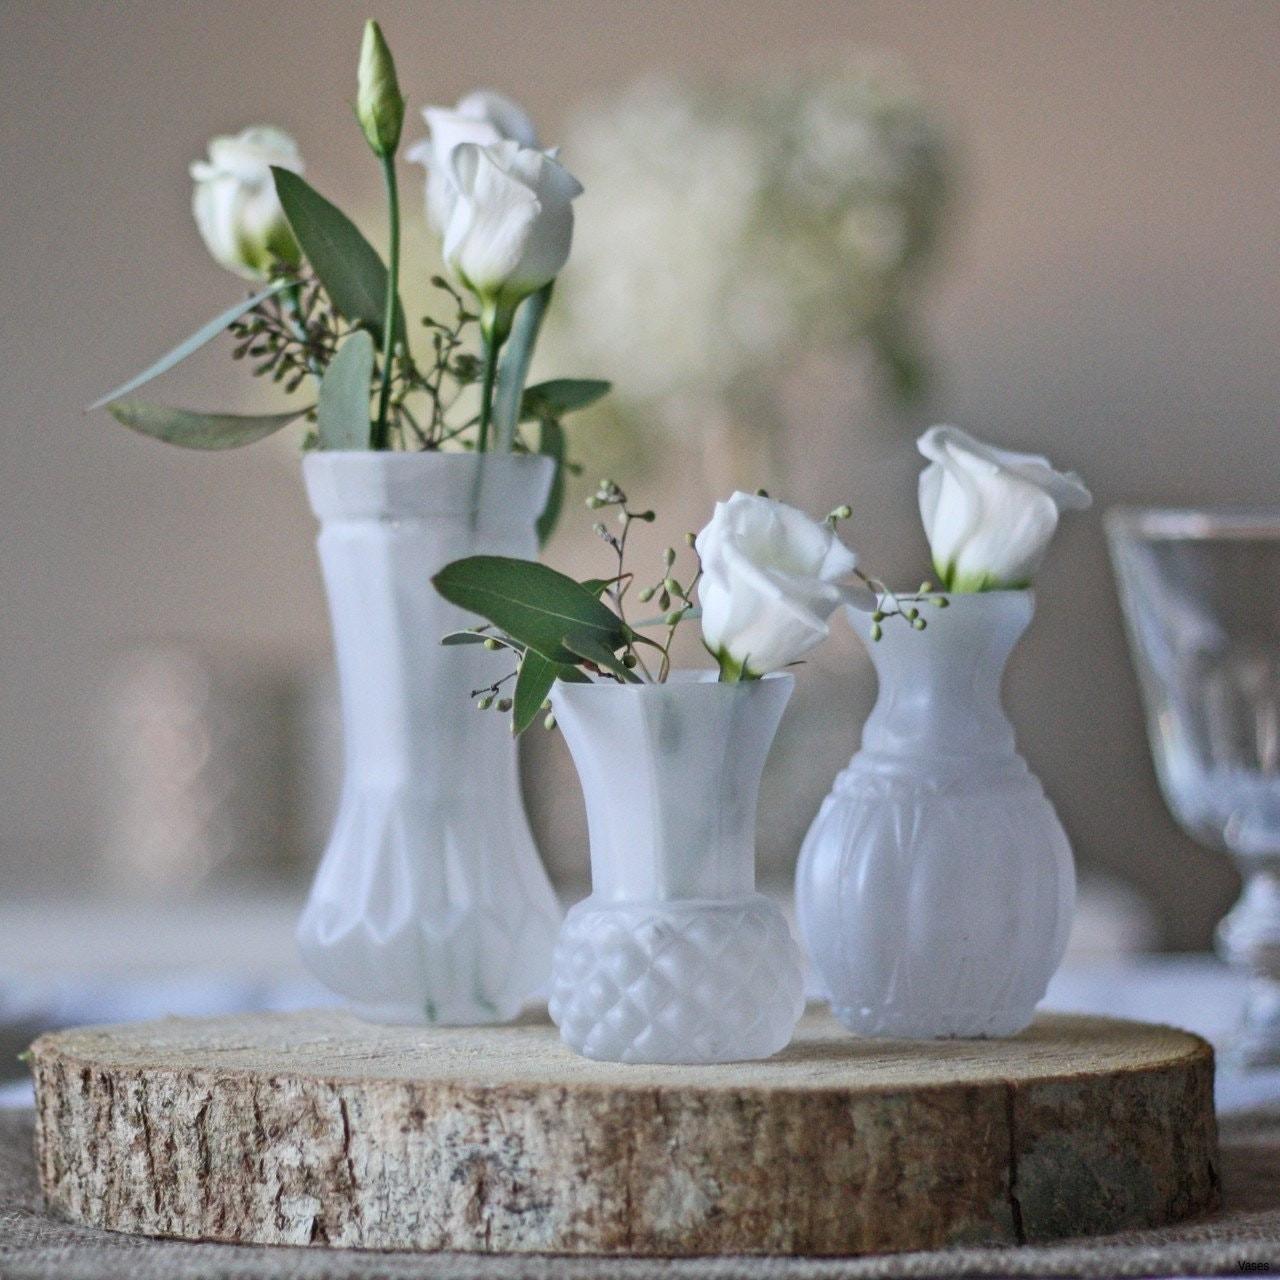 27 Stylish Cheap Wedding Vases for Sale 2021 free download cheap wedding vases for sale of 24 how much for wedding decorations italib net pertaining to jar flower 1h vases bud wedding vase centerpiece idea i 0d white scheme wedding decoration